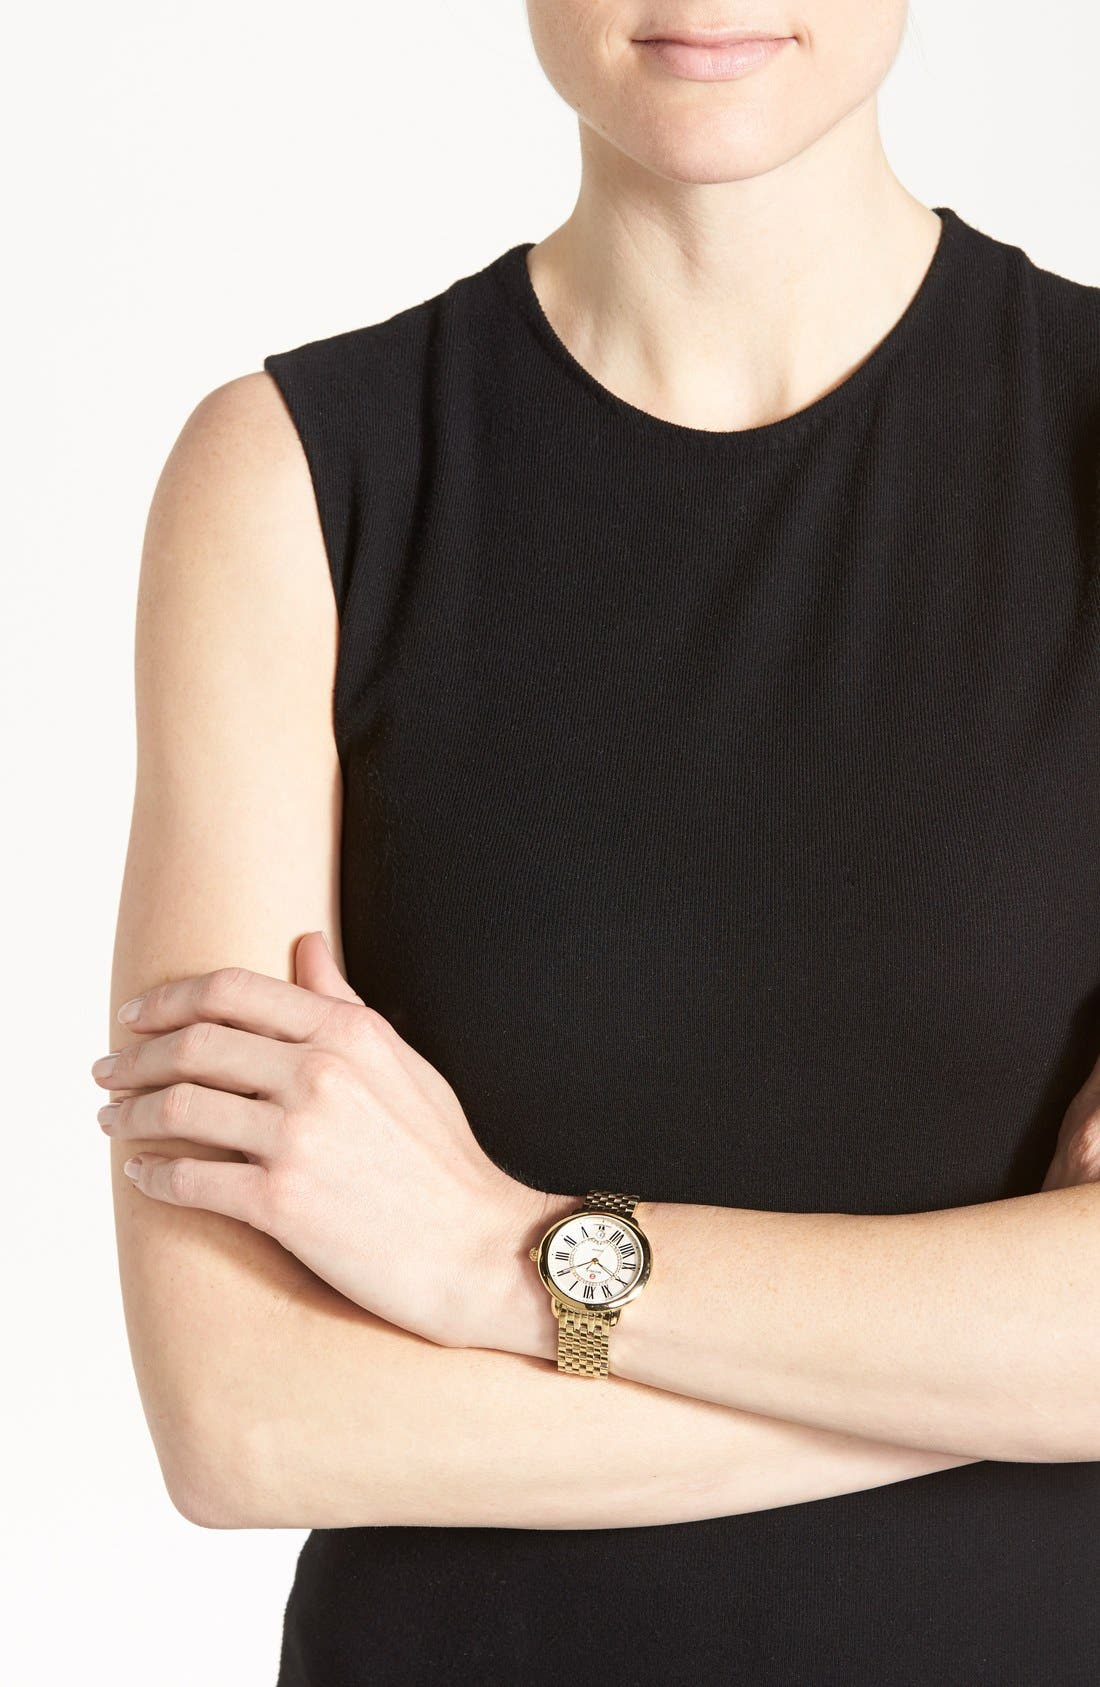 Serein 16 Diamond Dial Watch Head, 34mm x 36mm,                             Alternate thumbnail 6, color,                             GOLD